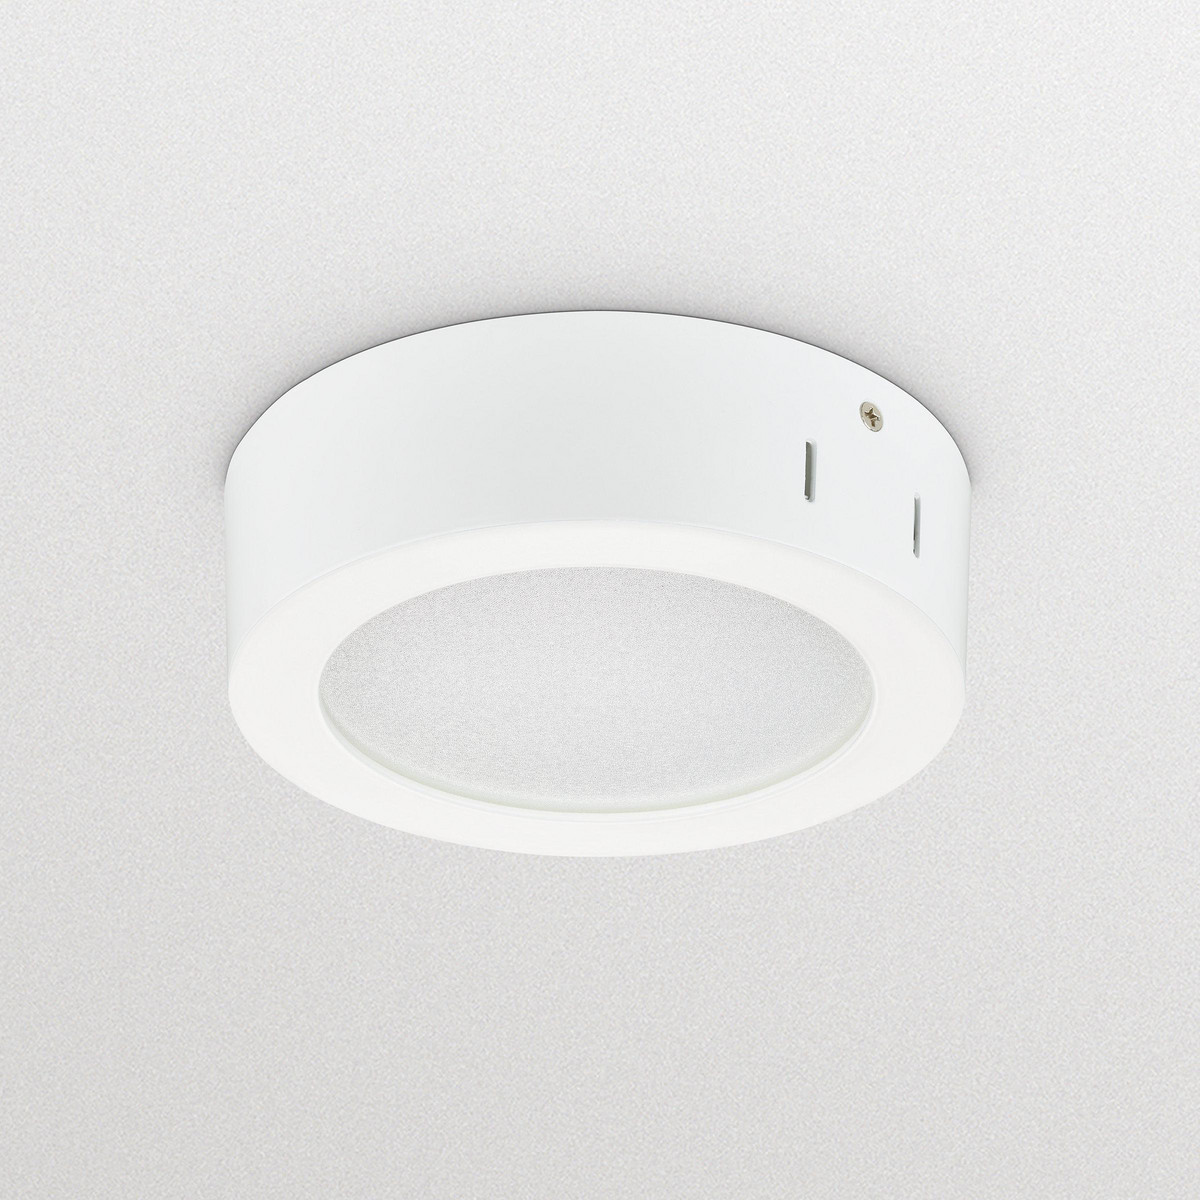 Philips CoreLine SlimDownlight Gen3 Påbyg DN145C 1100lm/830 11W Hvid